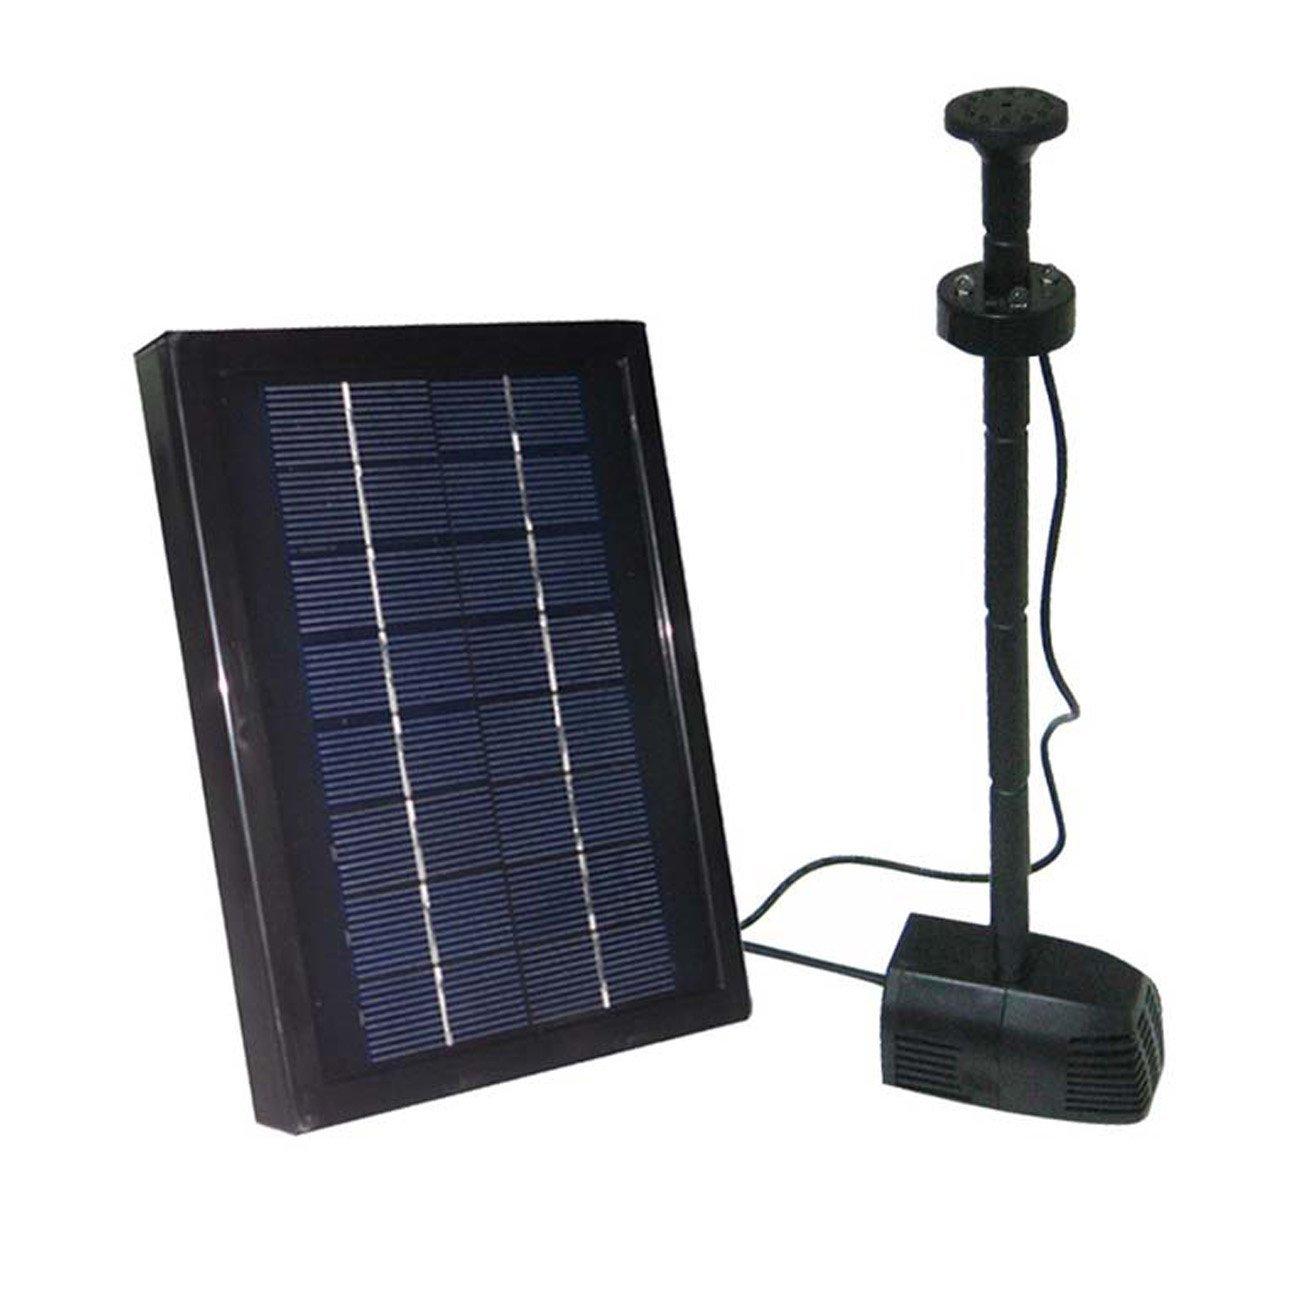 amazon com 2 5 watt solar water pump kit with battery pond